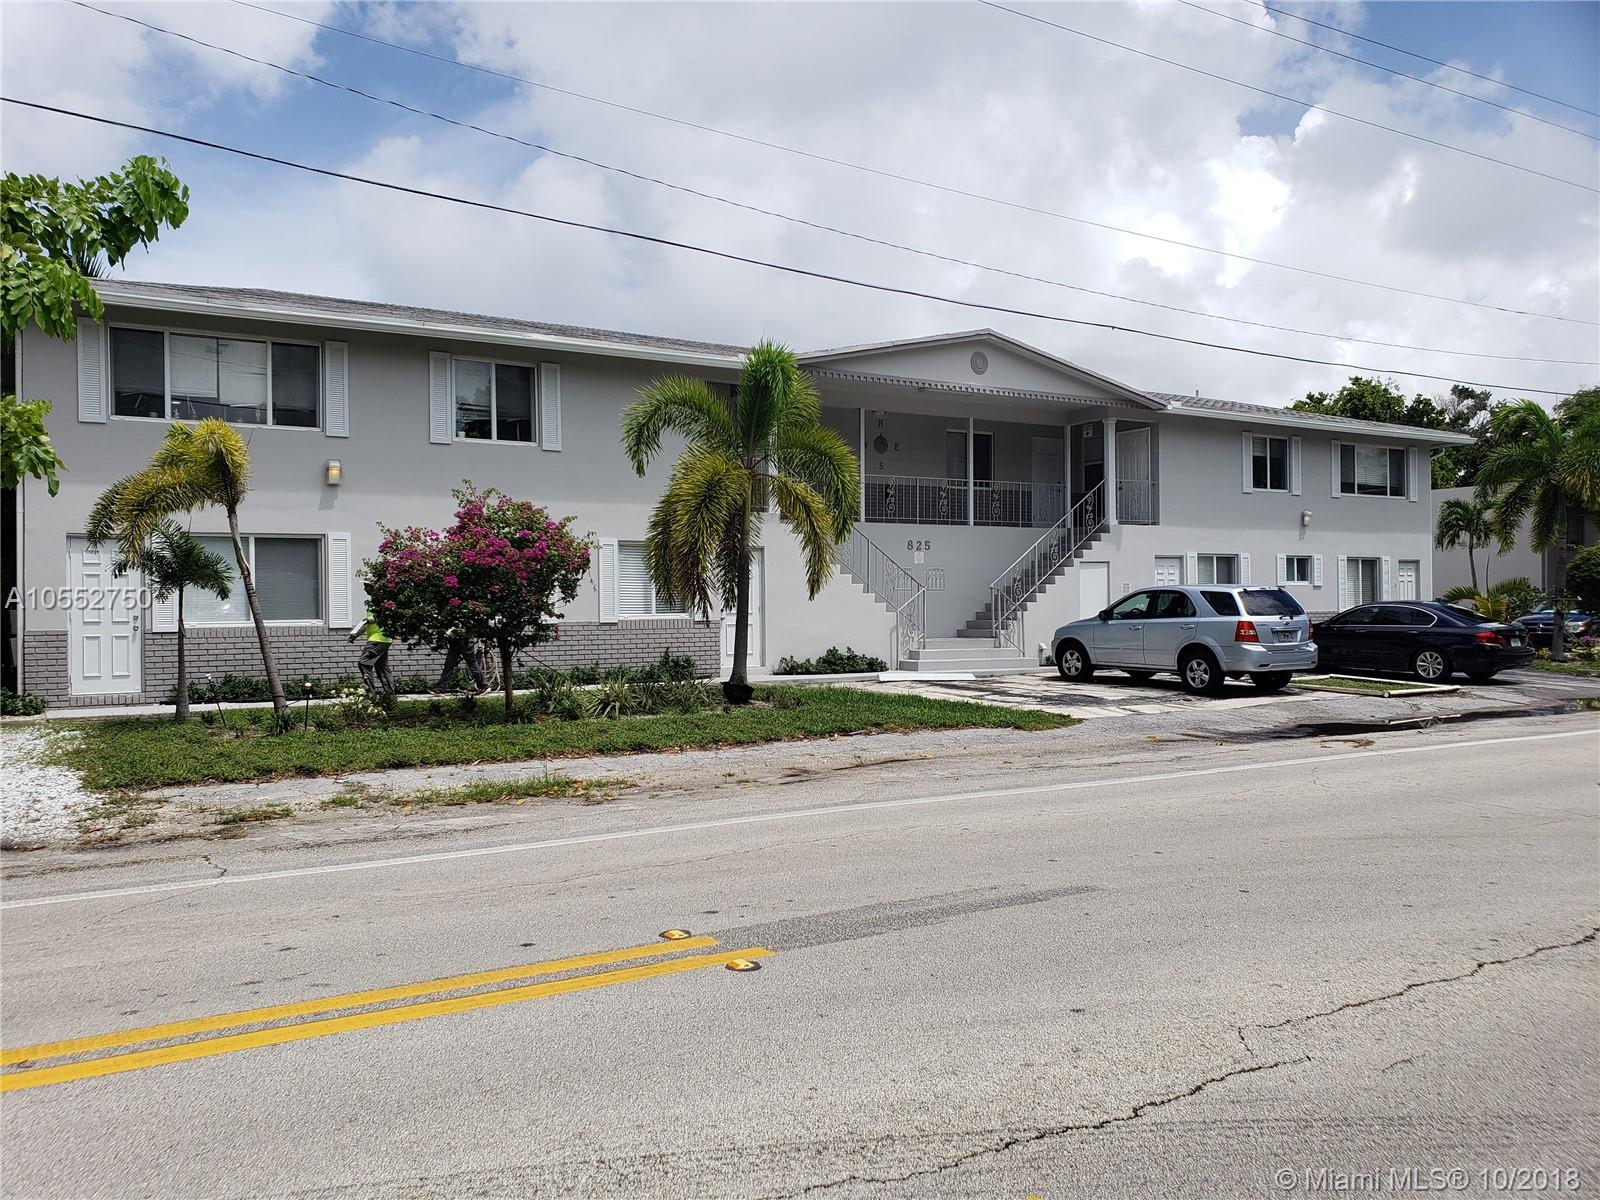 825 NE 6th St, Fort Lauderdale, FL 33304